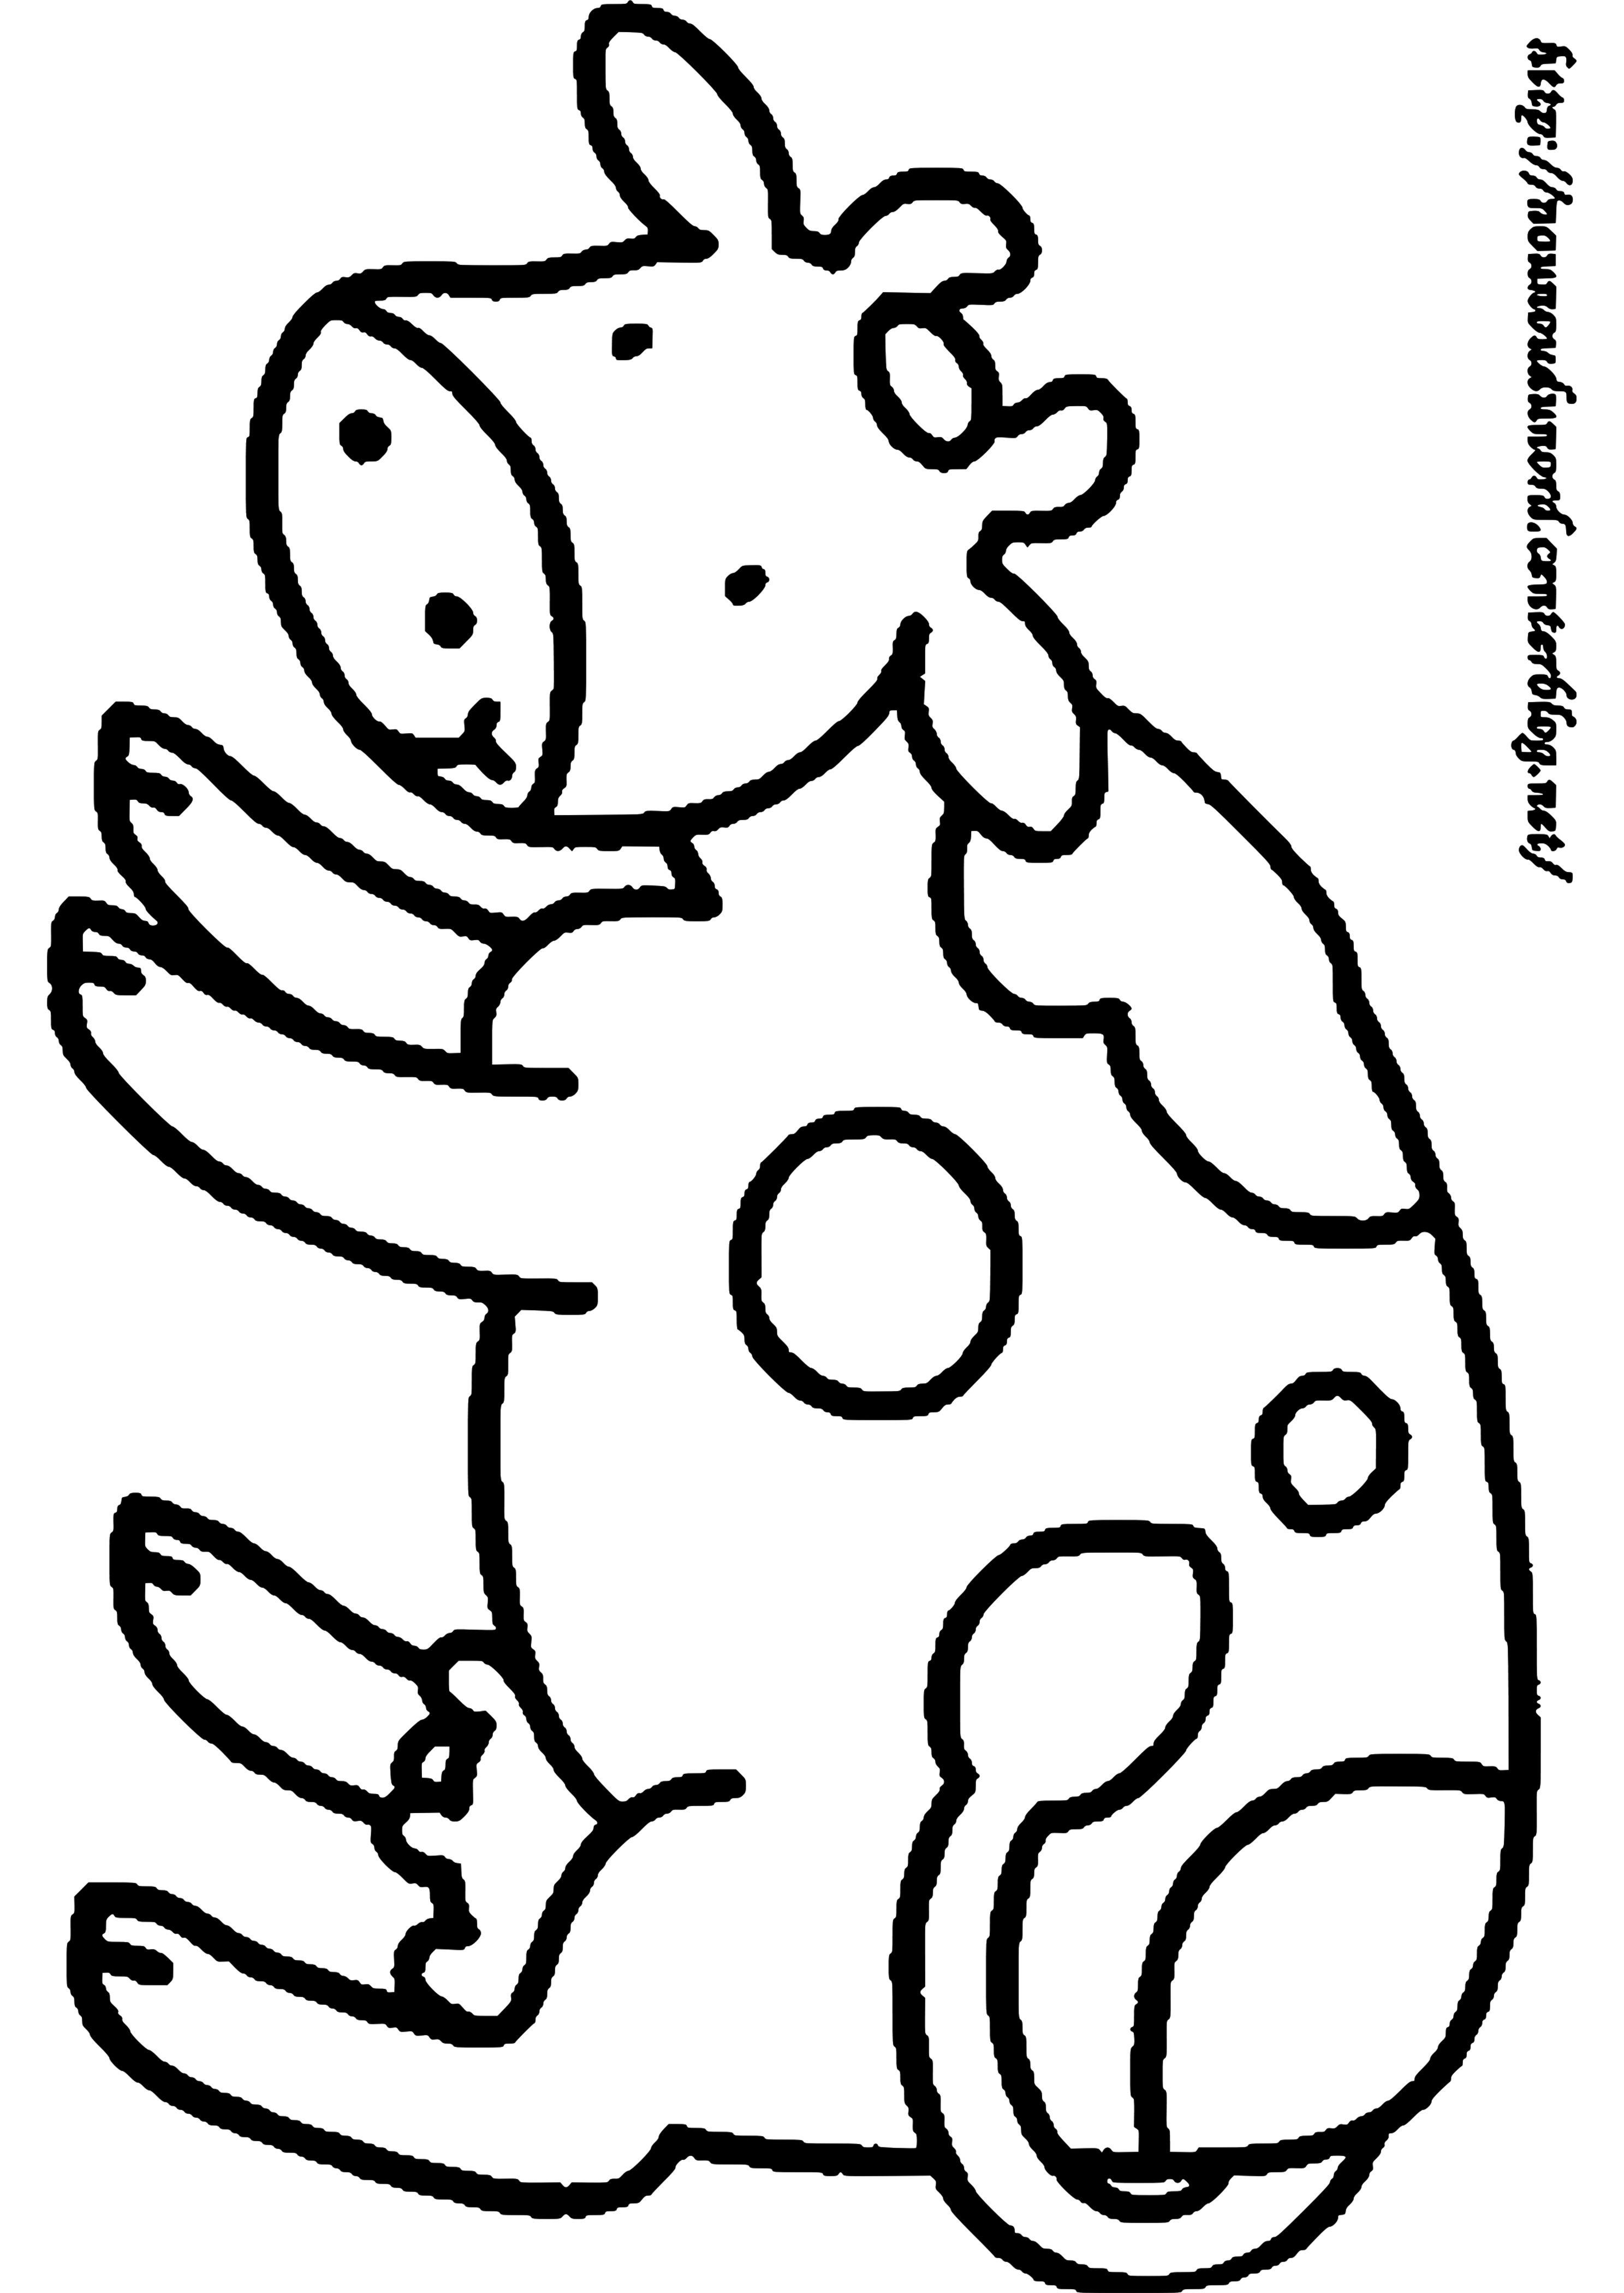 Malvorlage Kuh Malvorlagen Kuh Lustige Kuhe